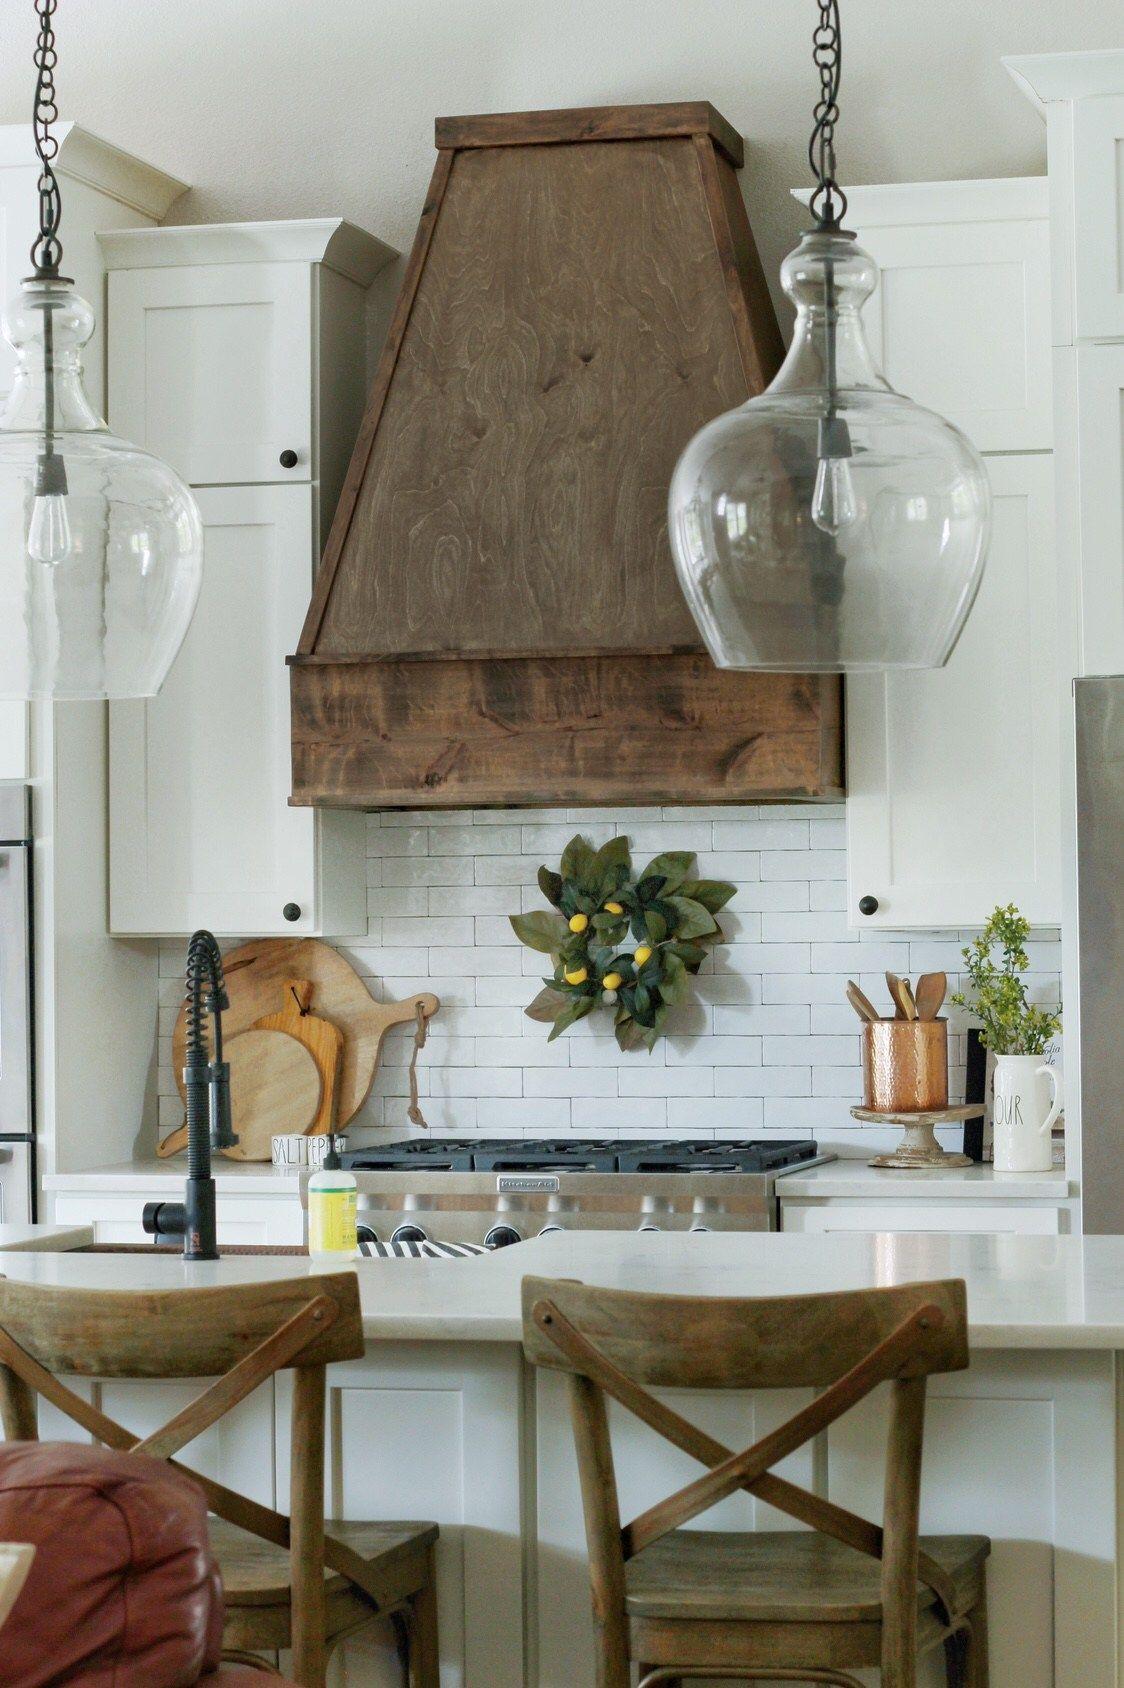 Diy wood hood vent kitchen vent hood kitchen vent